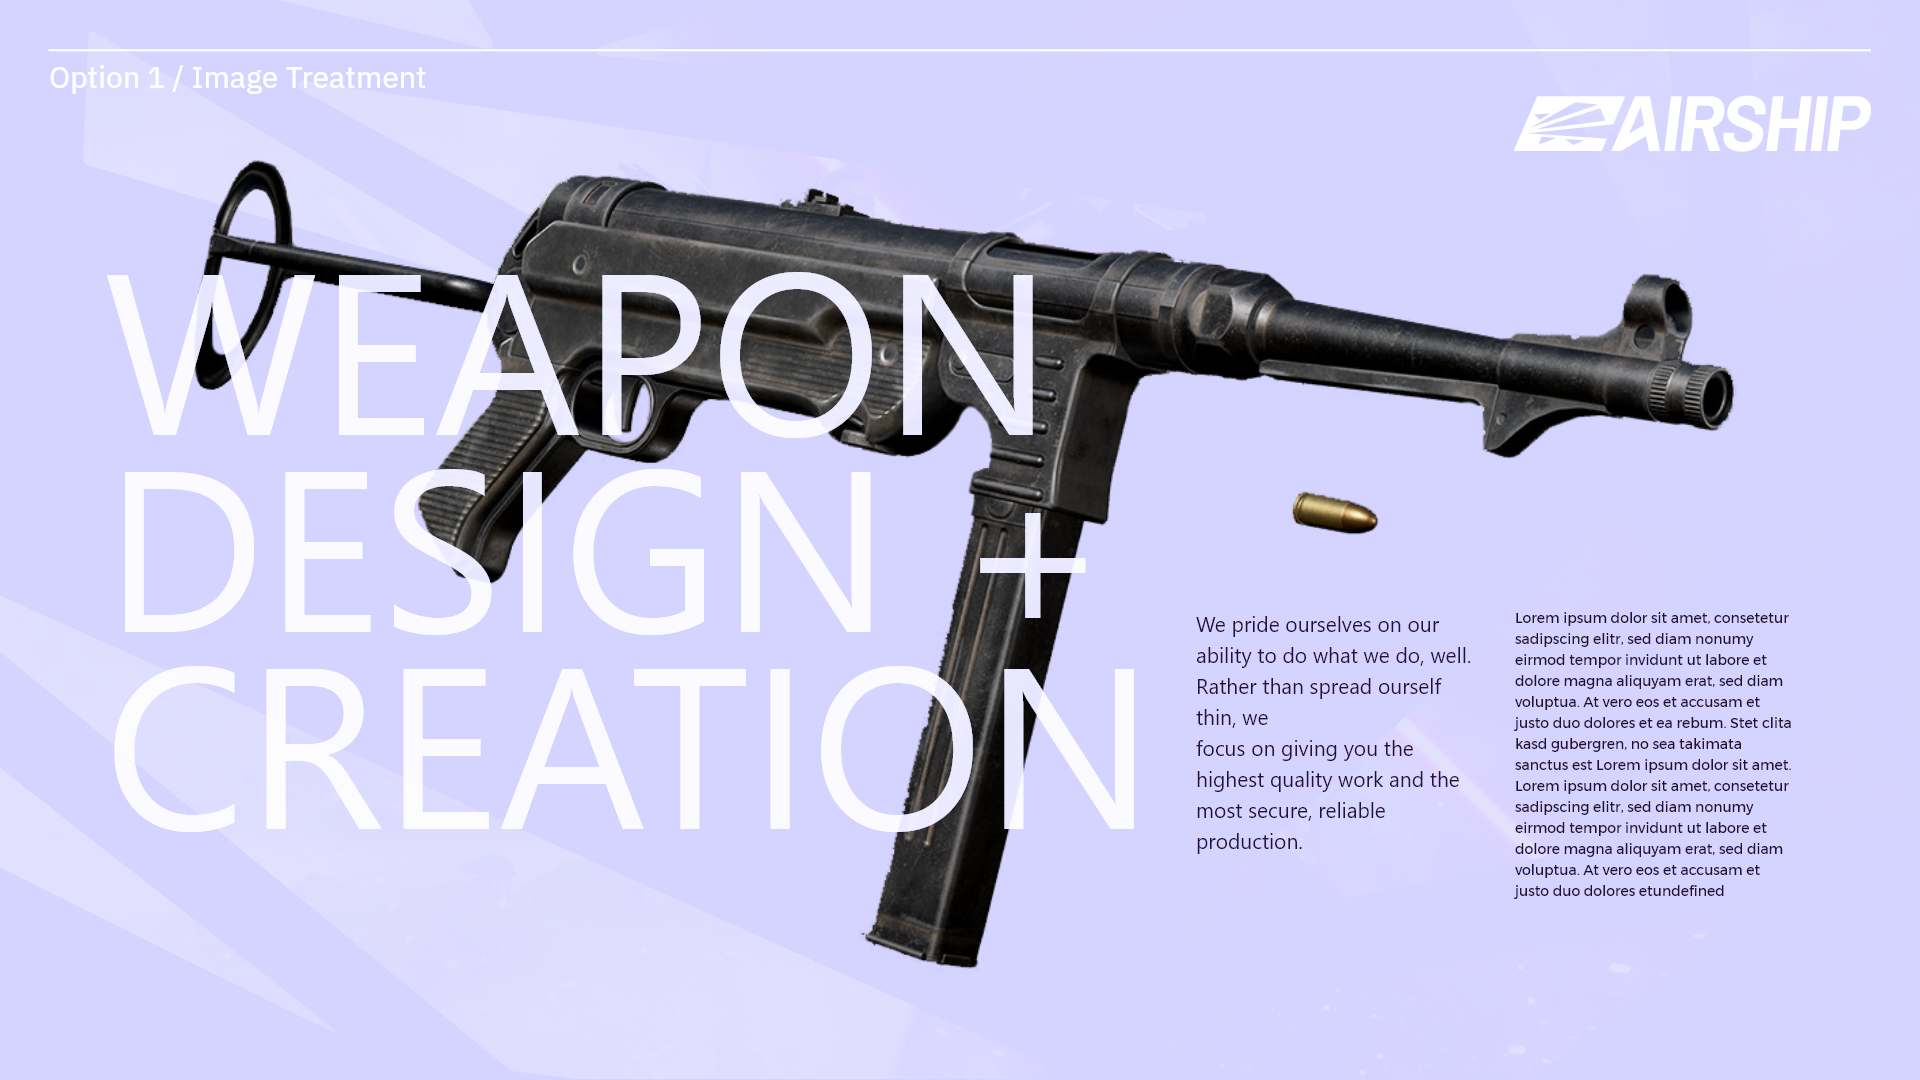 Airship Images | Design & Branding 4